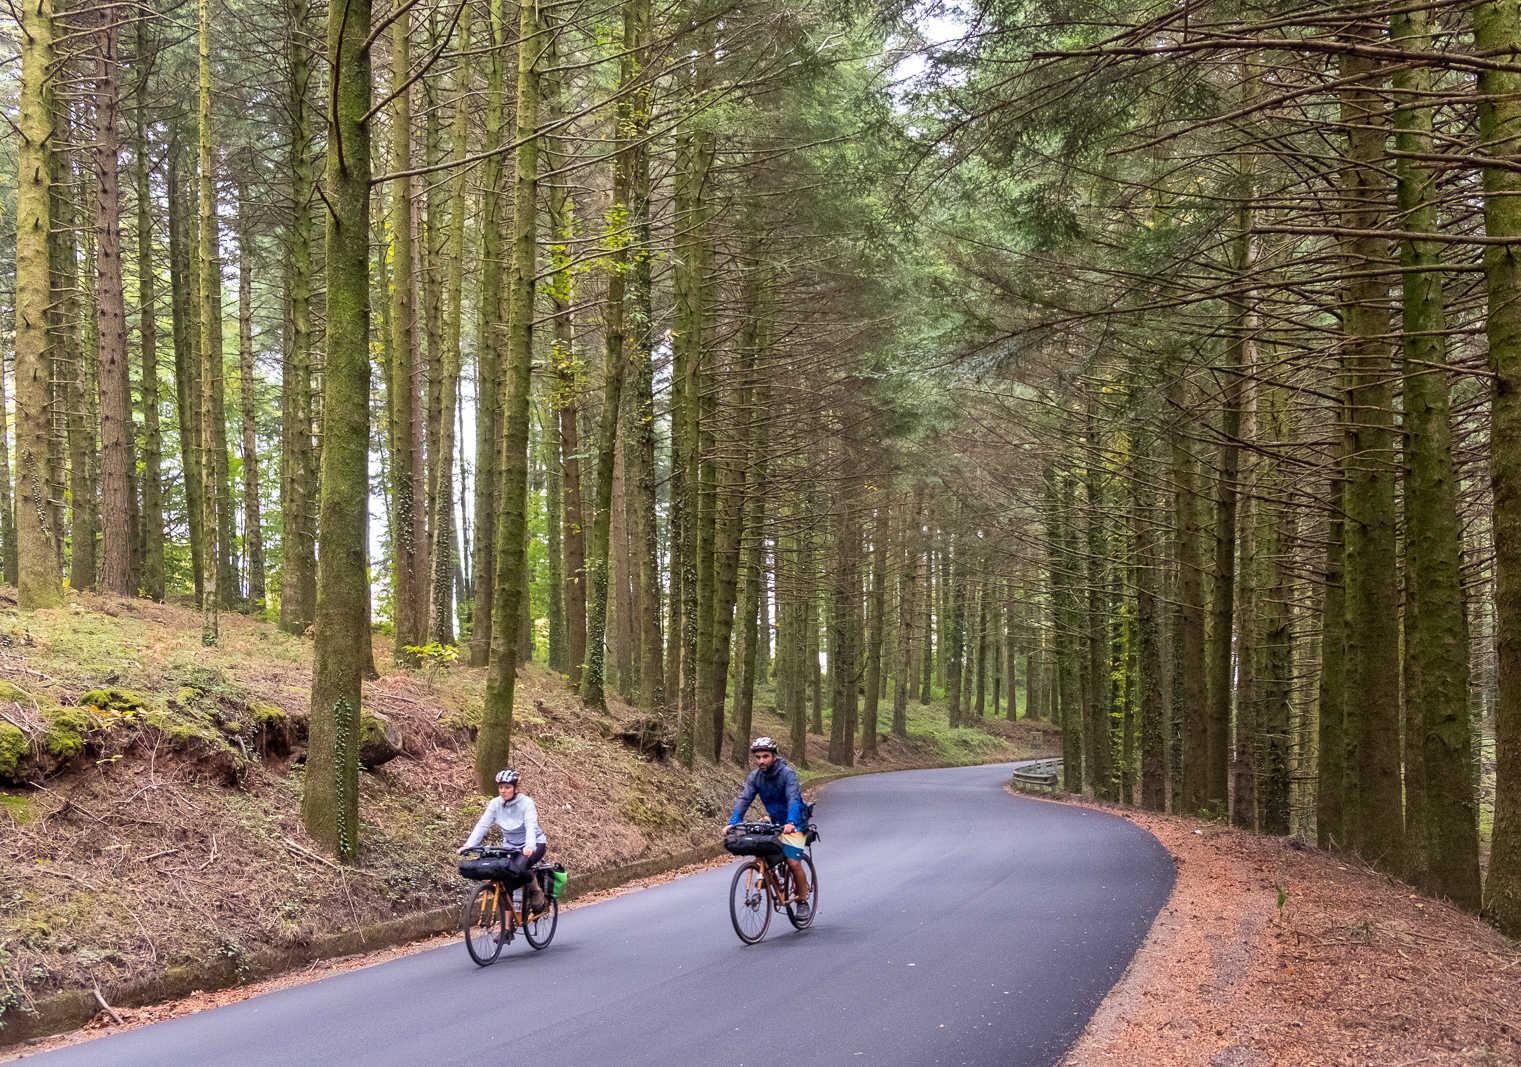 Italian Green Road Award 2021